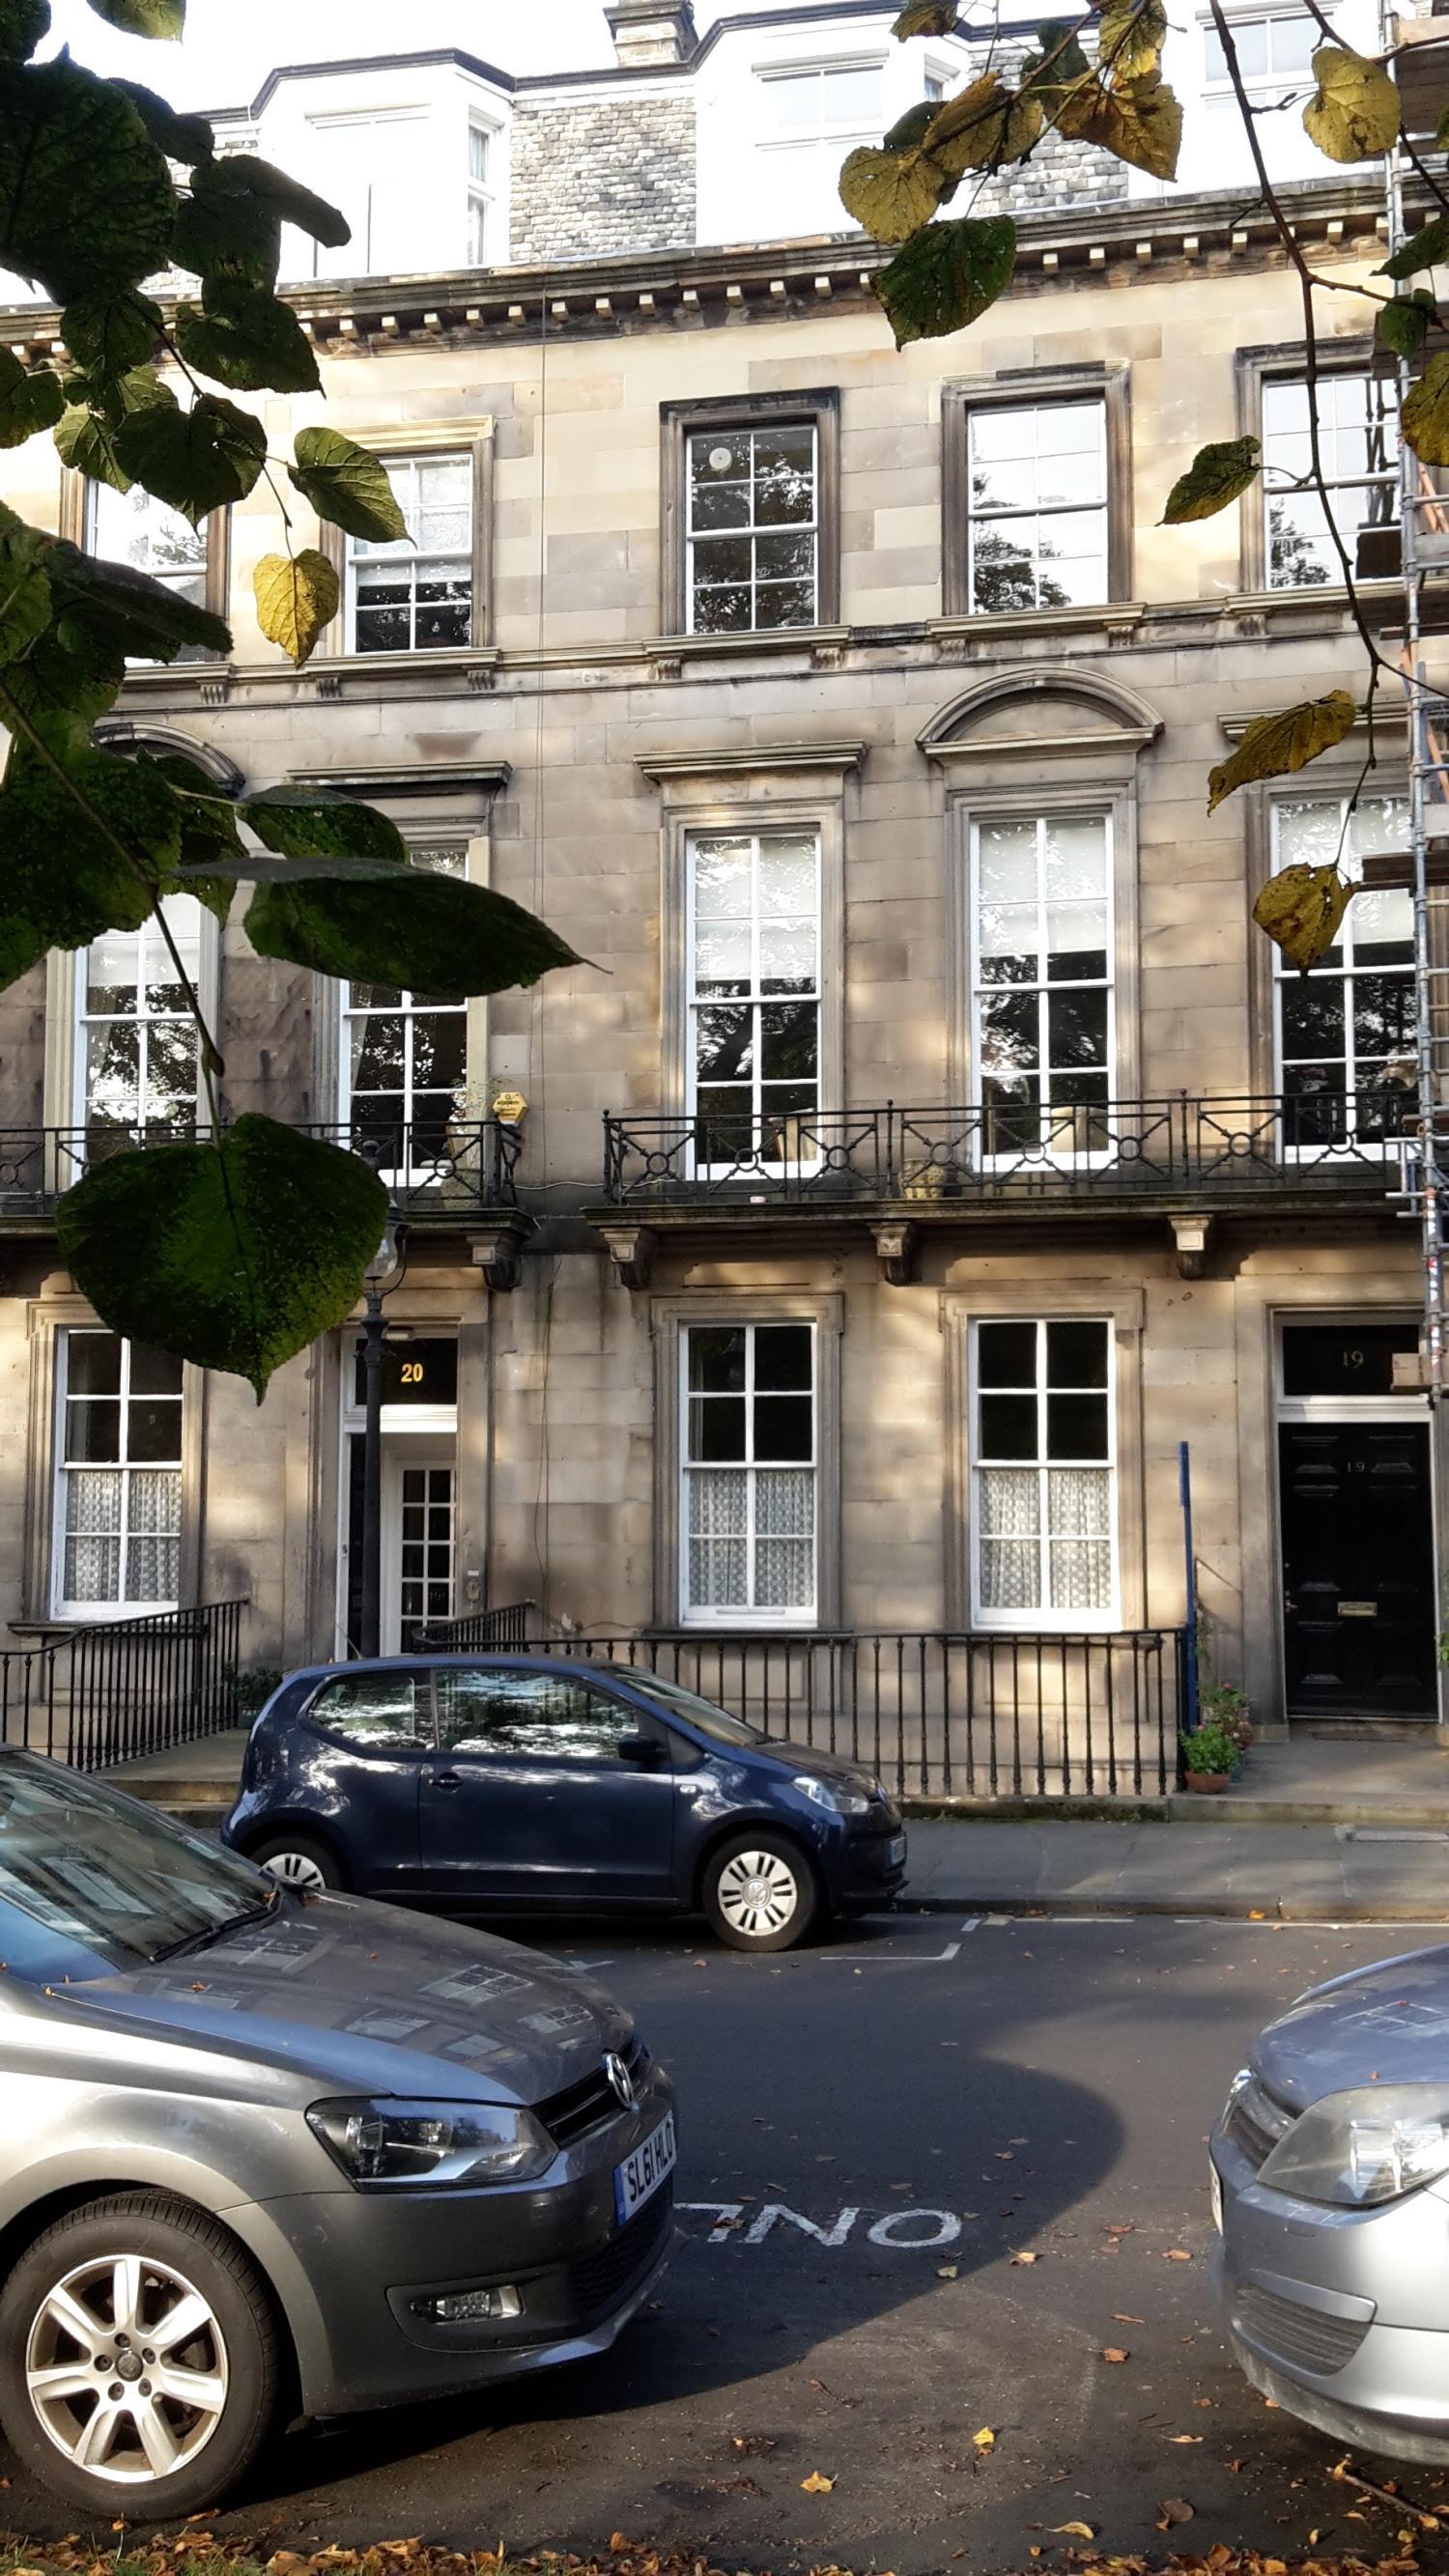 View property for rent Clarendon Crescent, Edinburgh